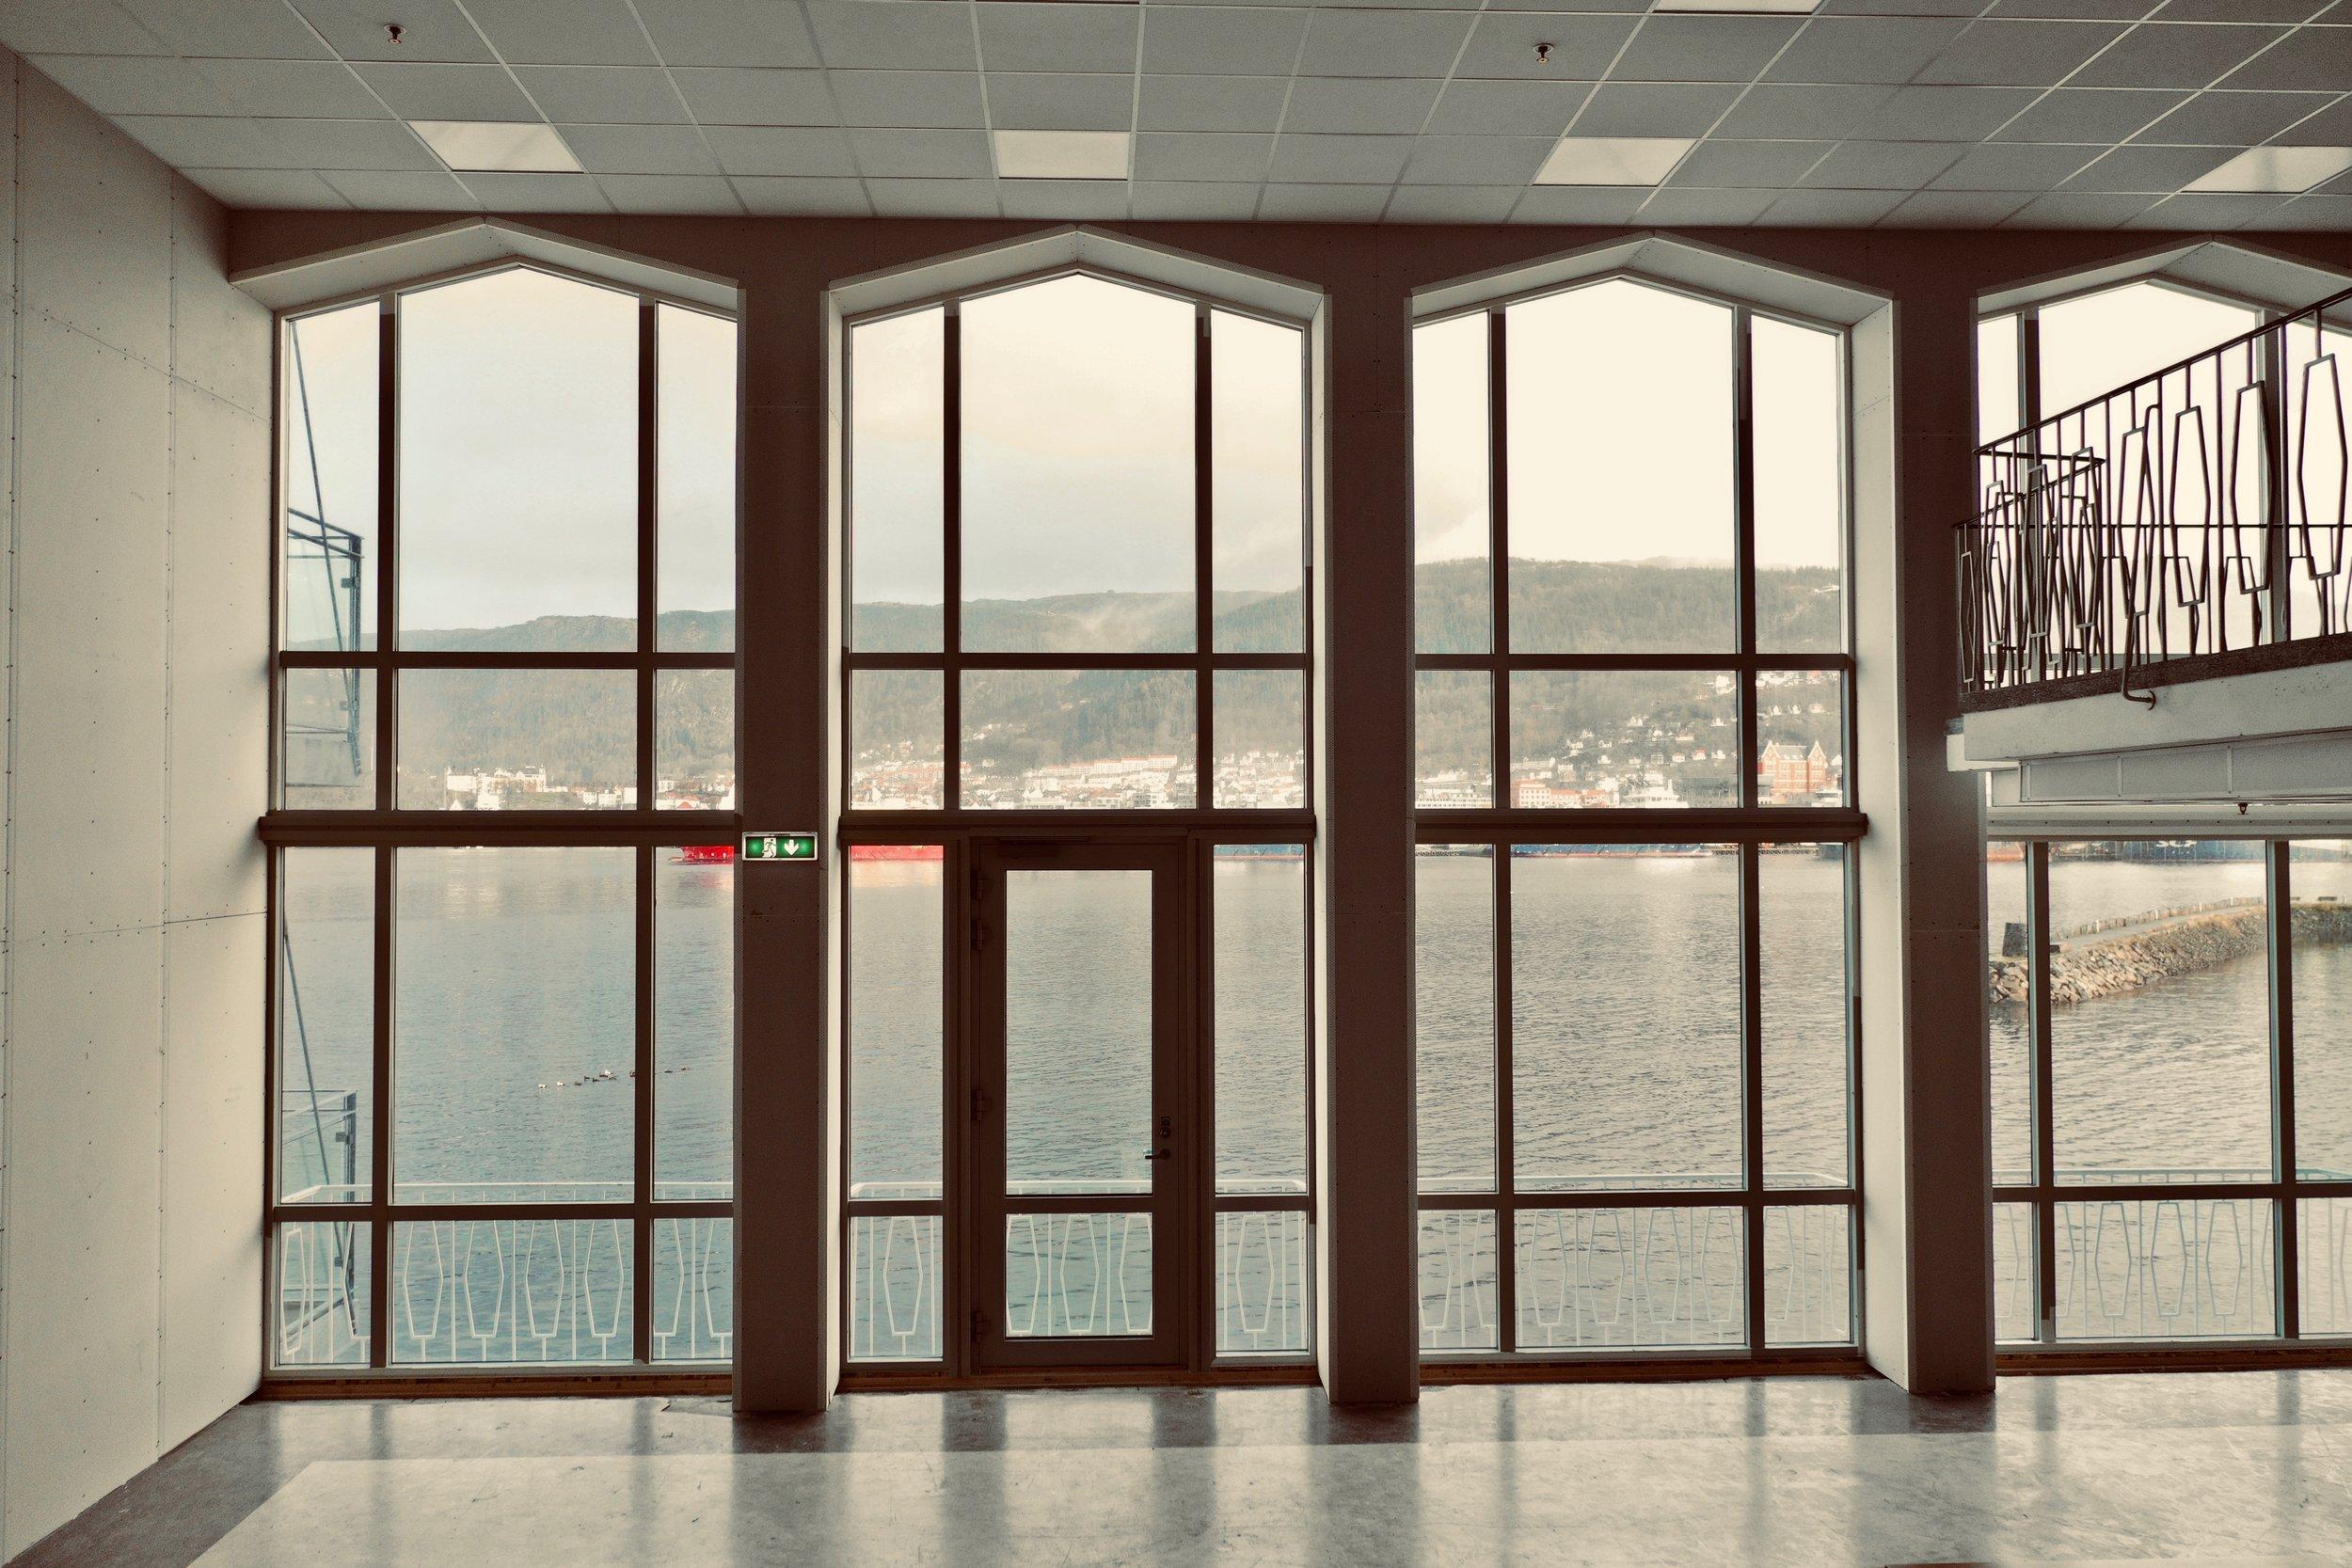 Næringslokaler til salgs - Fleksible lokaler til salgs i Laksevåg.